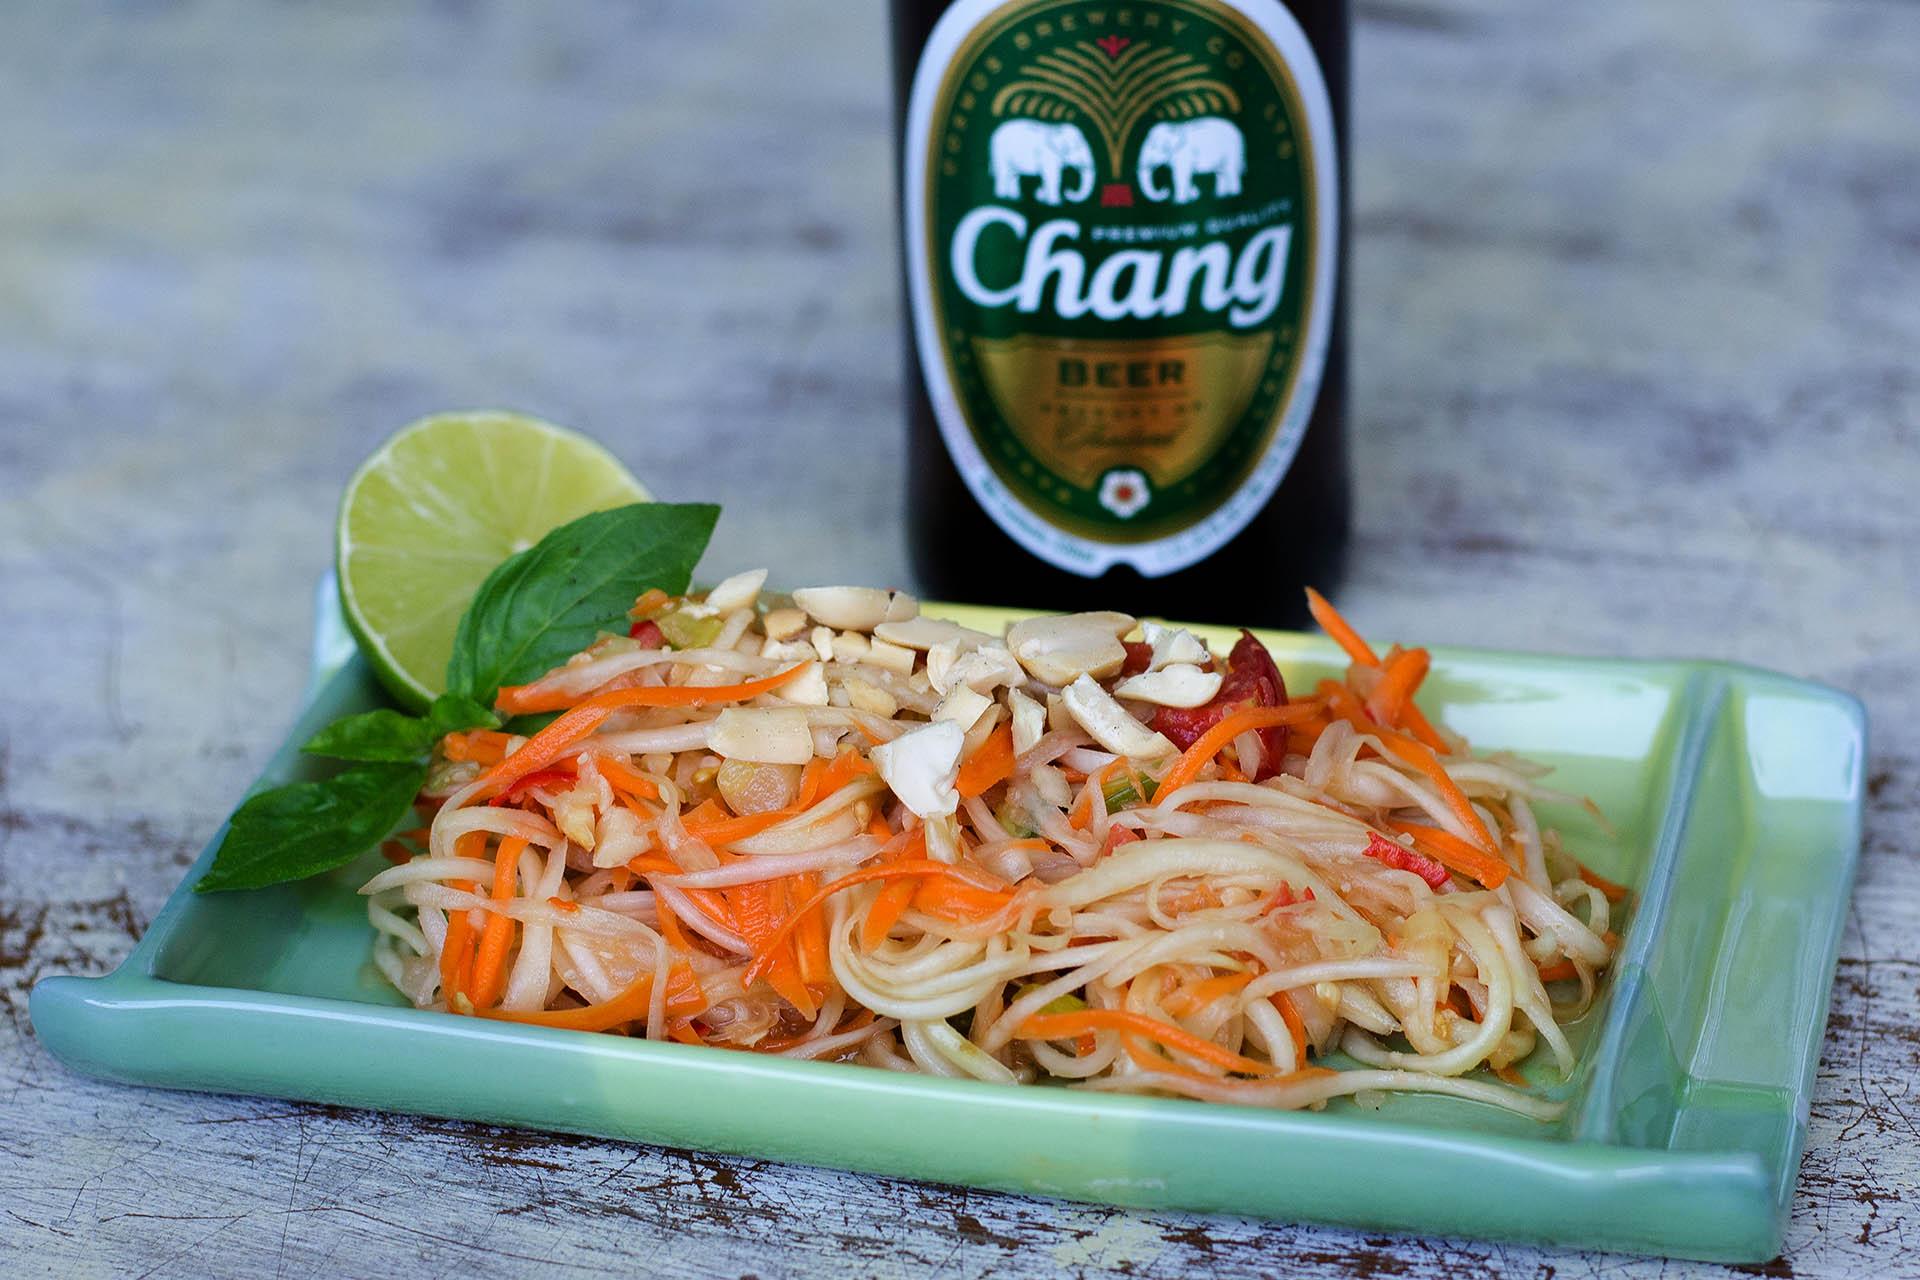 Papayasalat fertig mit Chang Bier